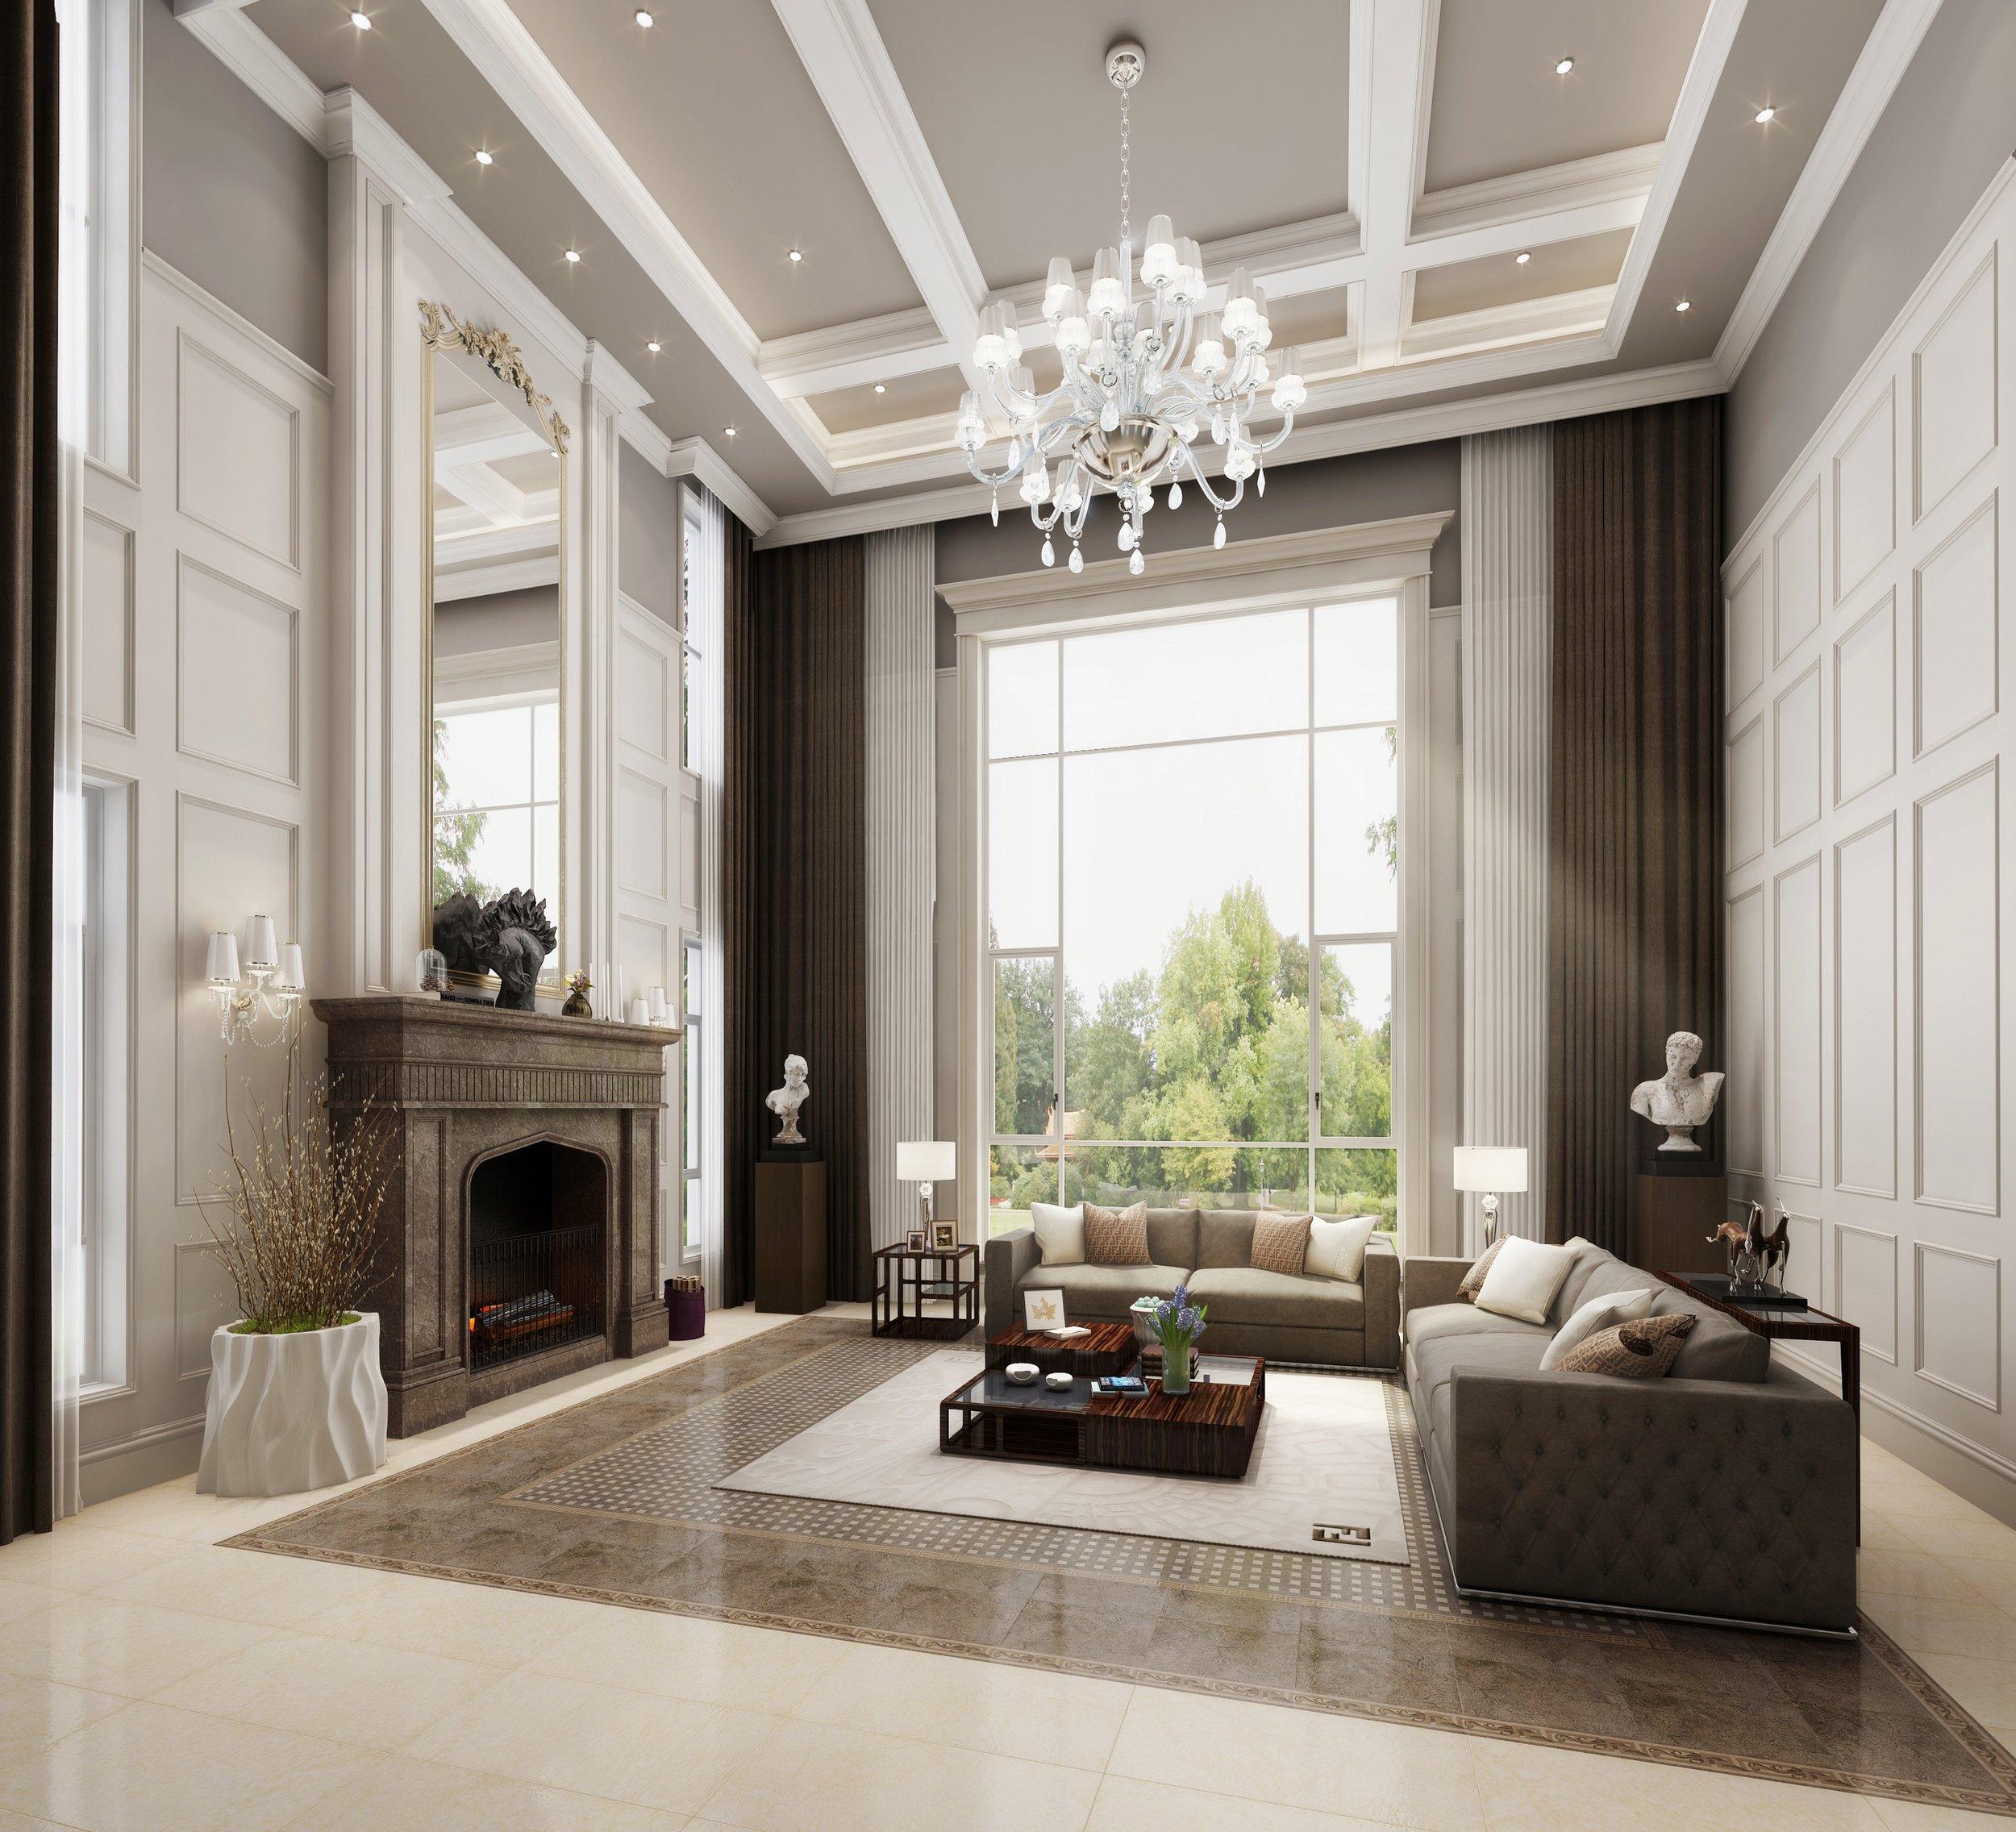 02 Fendi living room.jpeg